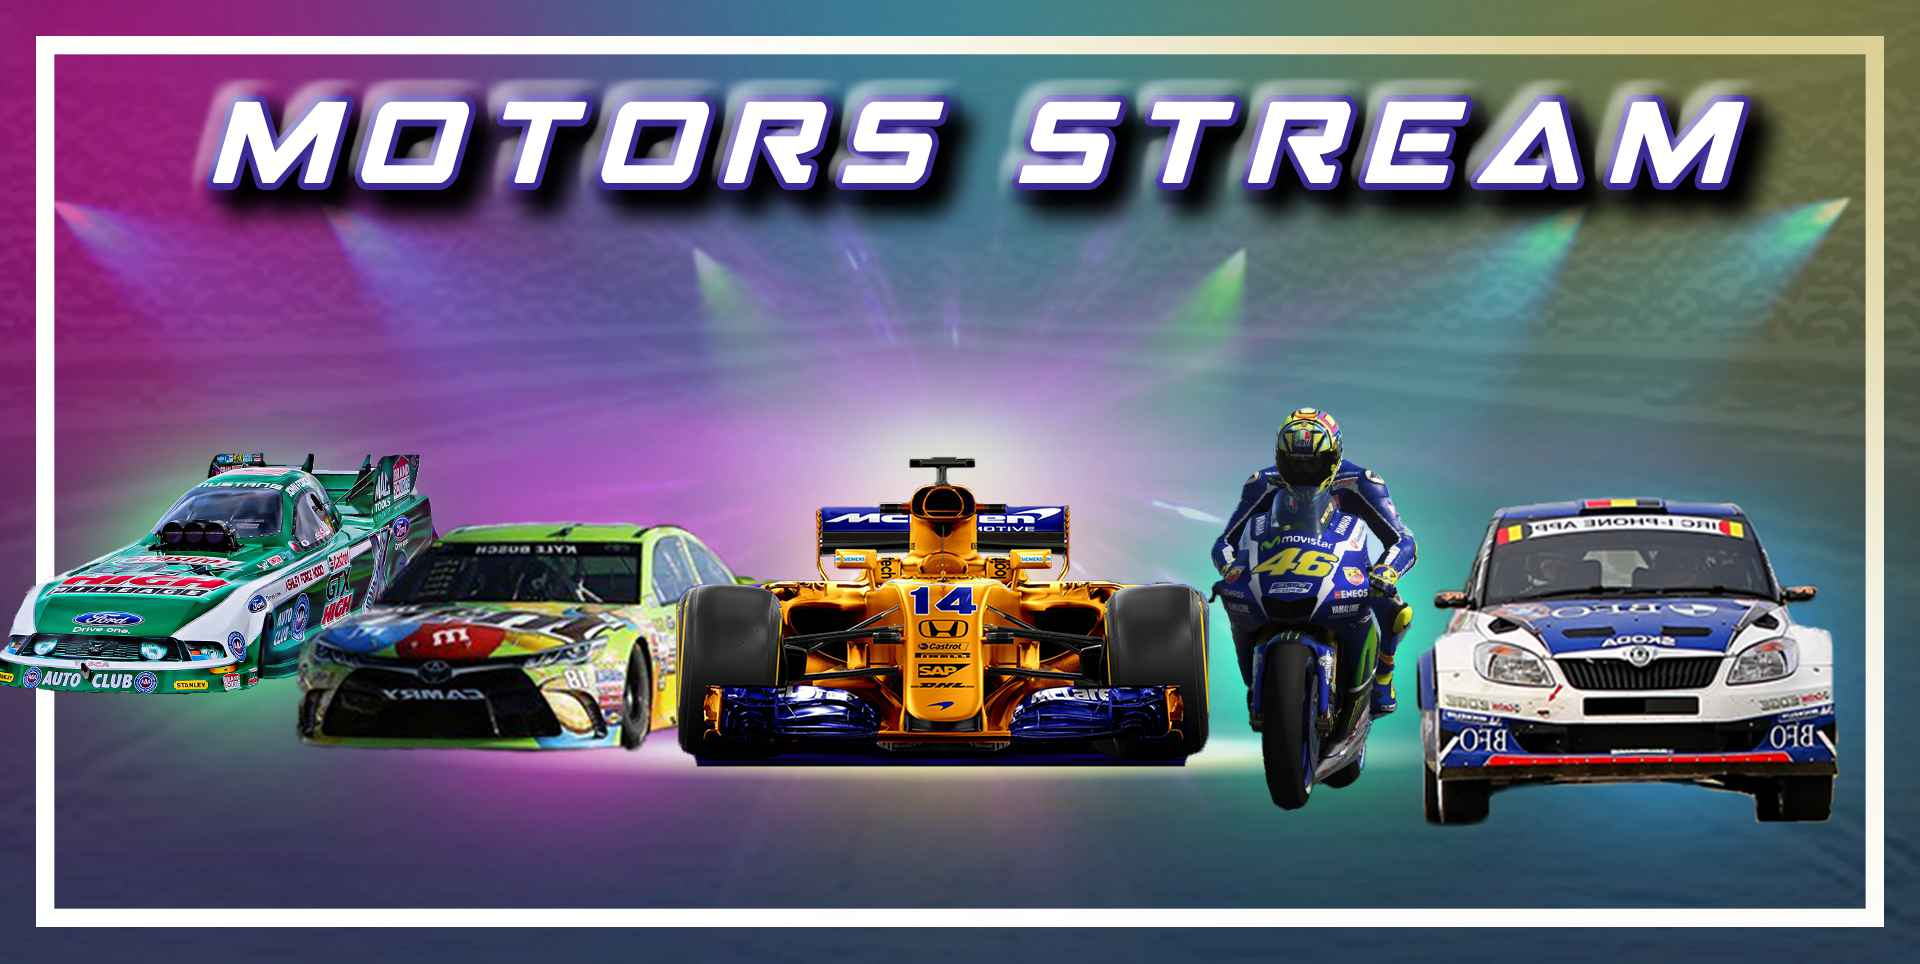 F1 2018 Australian Grand Prix Live